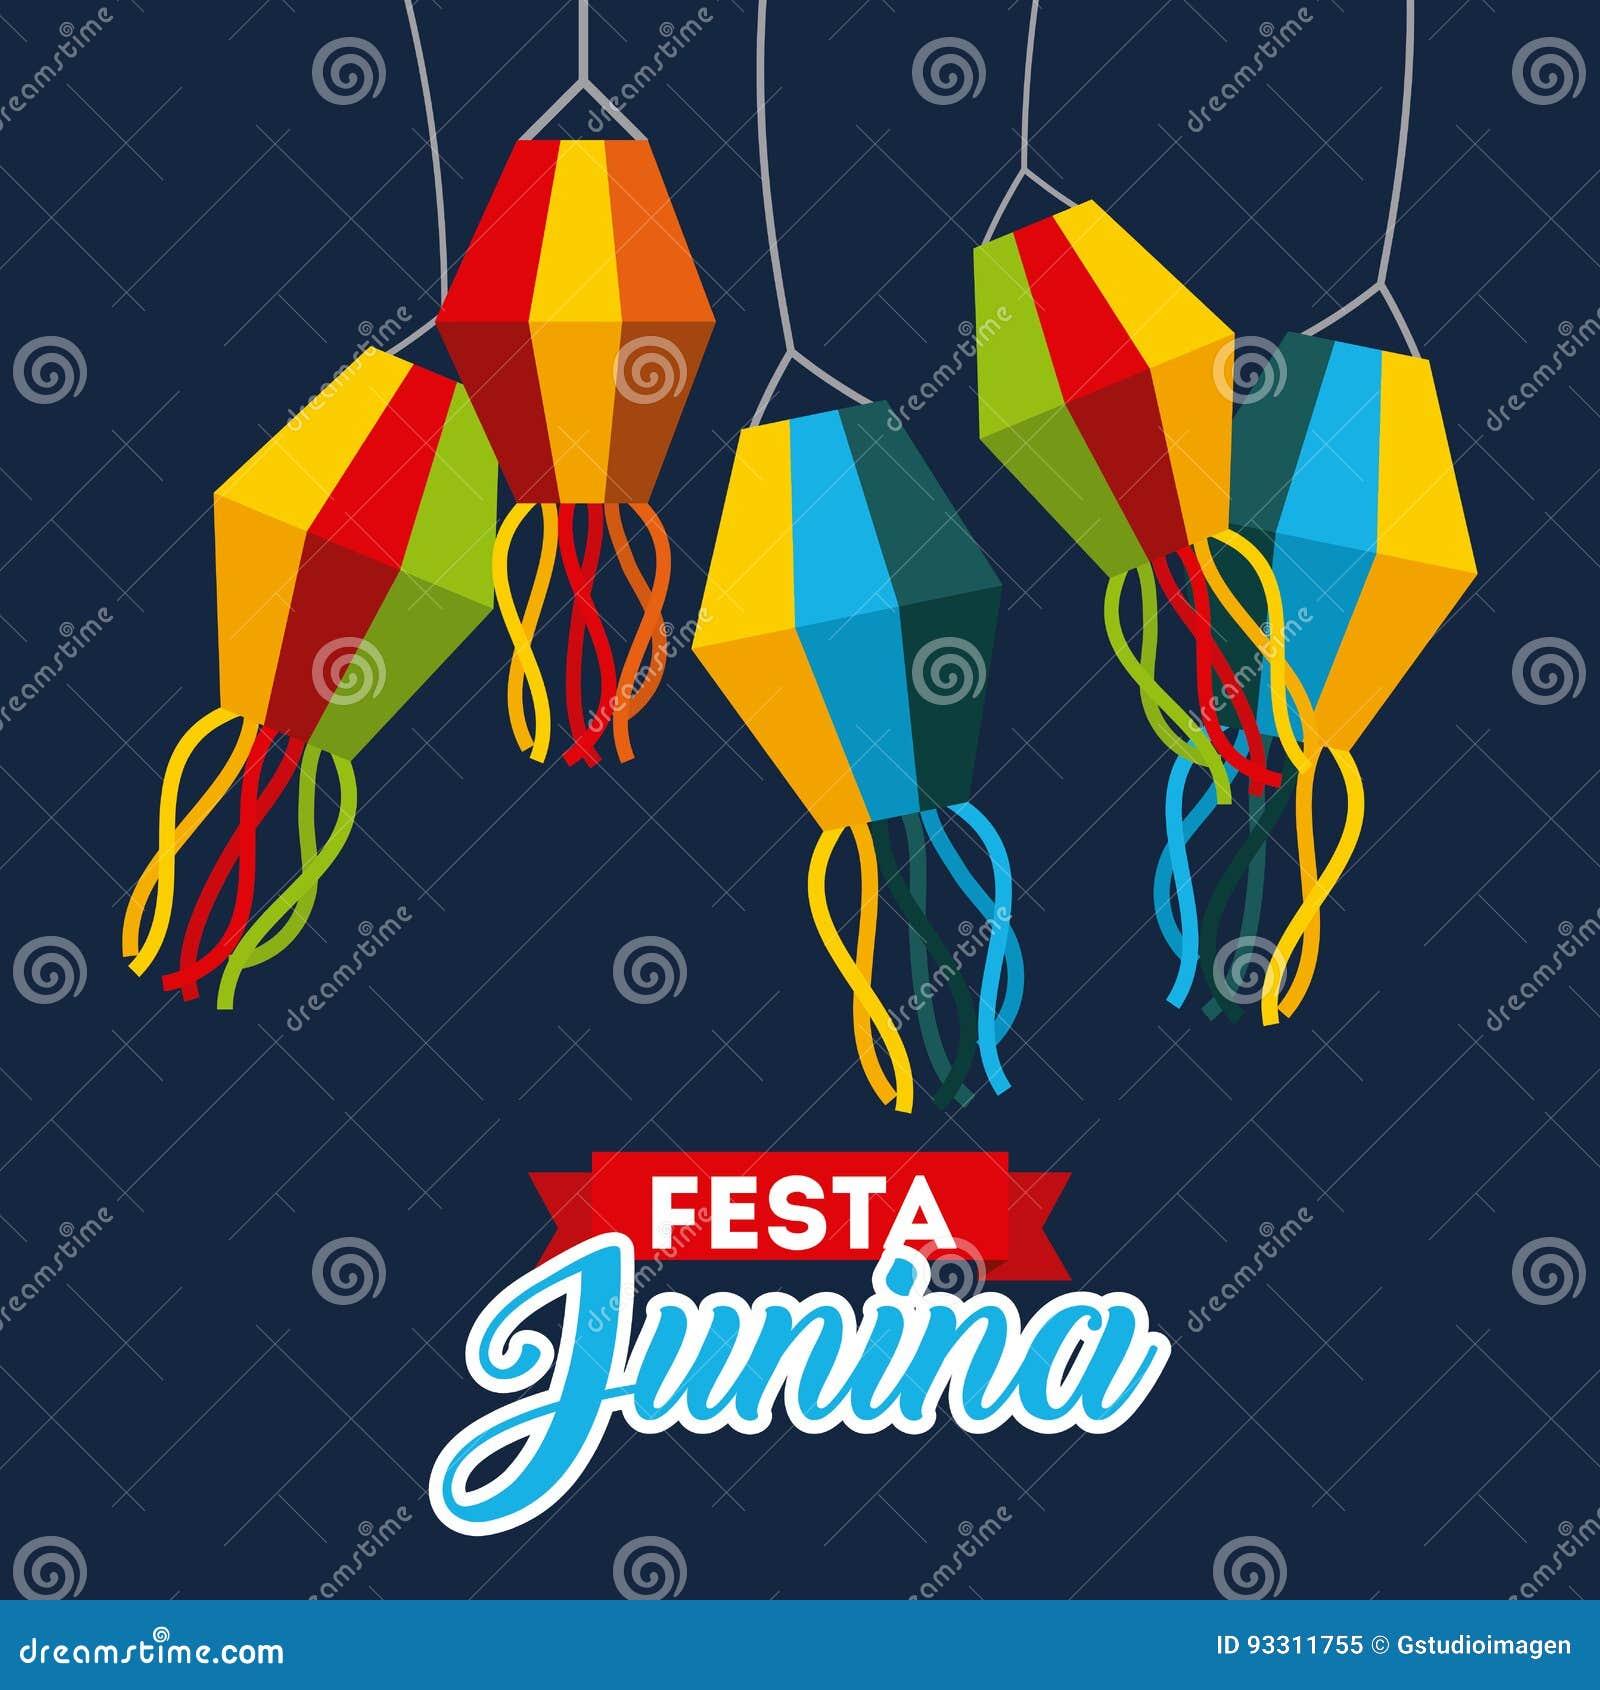 Festivity june illustration